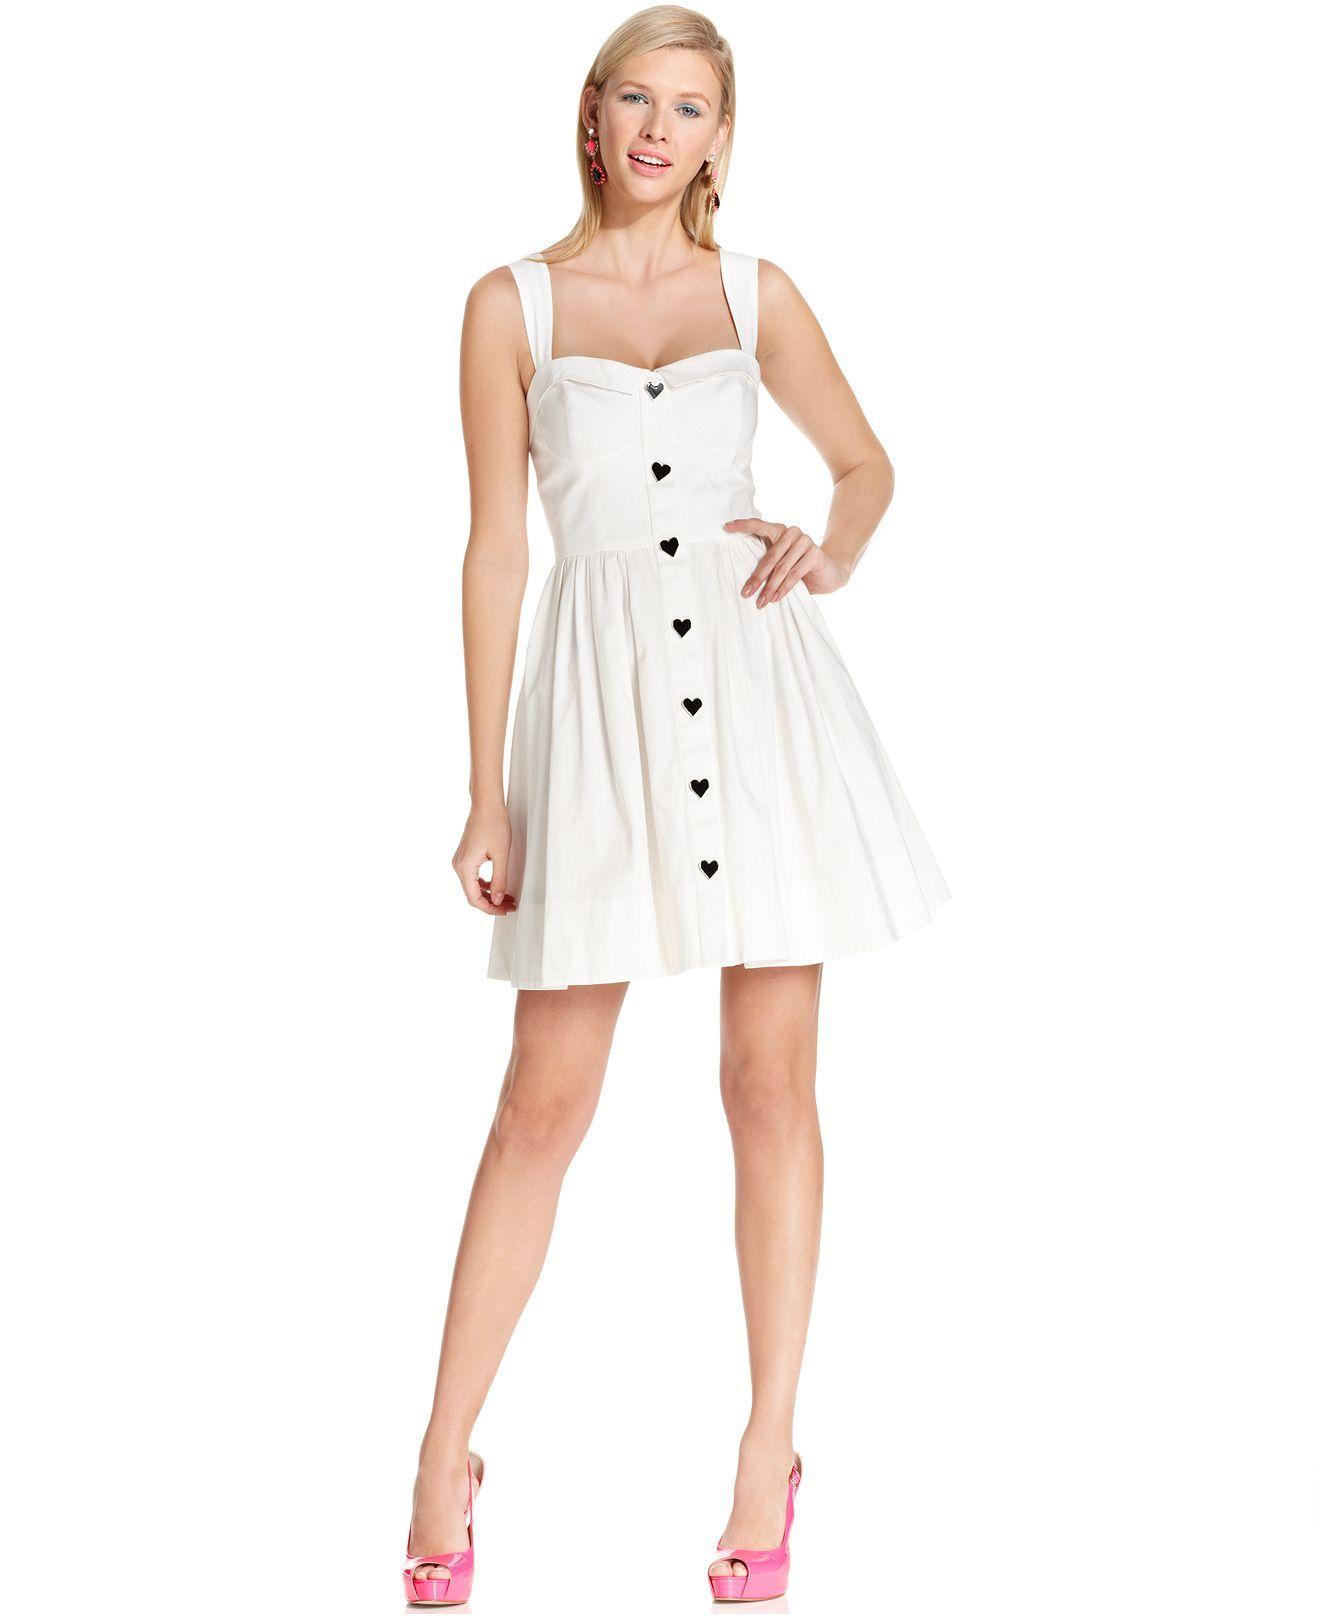 Betsey johnson wedding dresses  Betsey Johnson Dress Sleeveless HeartButton ALine  Dresses